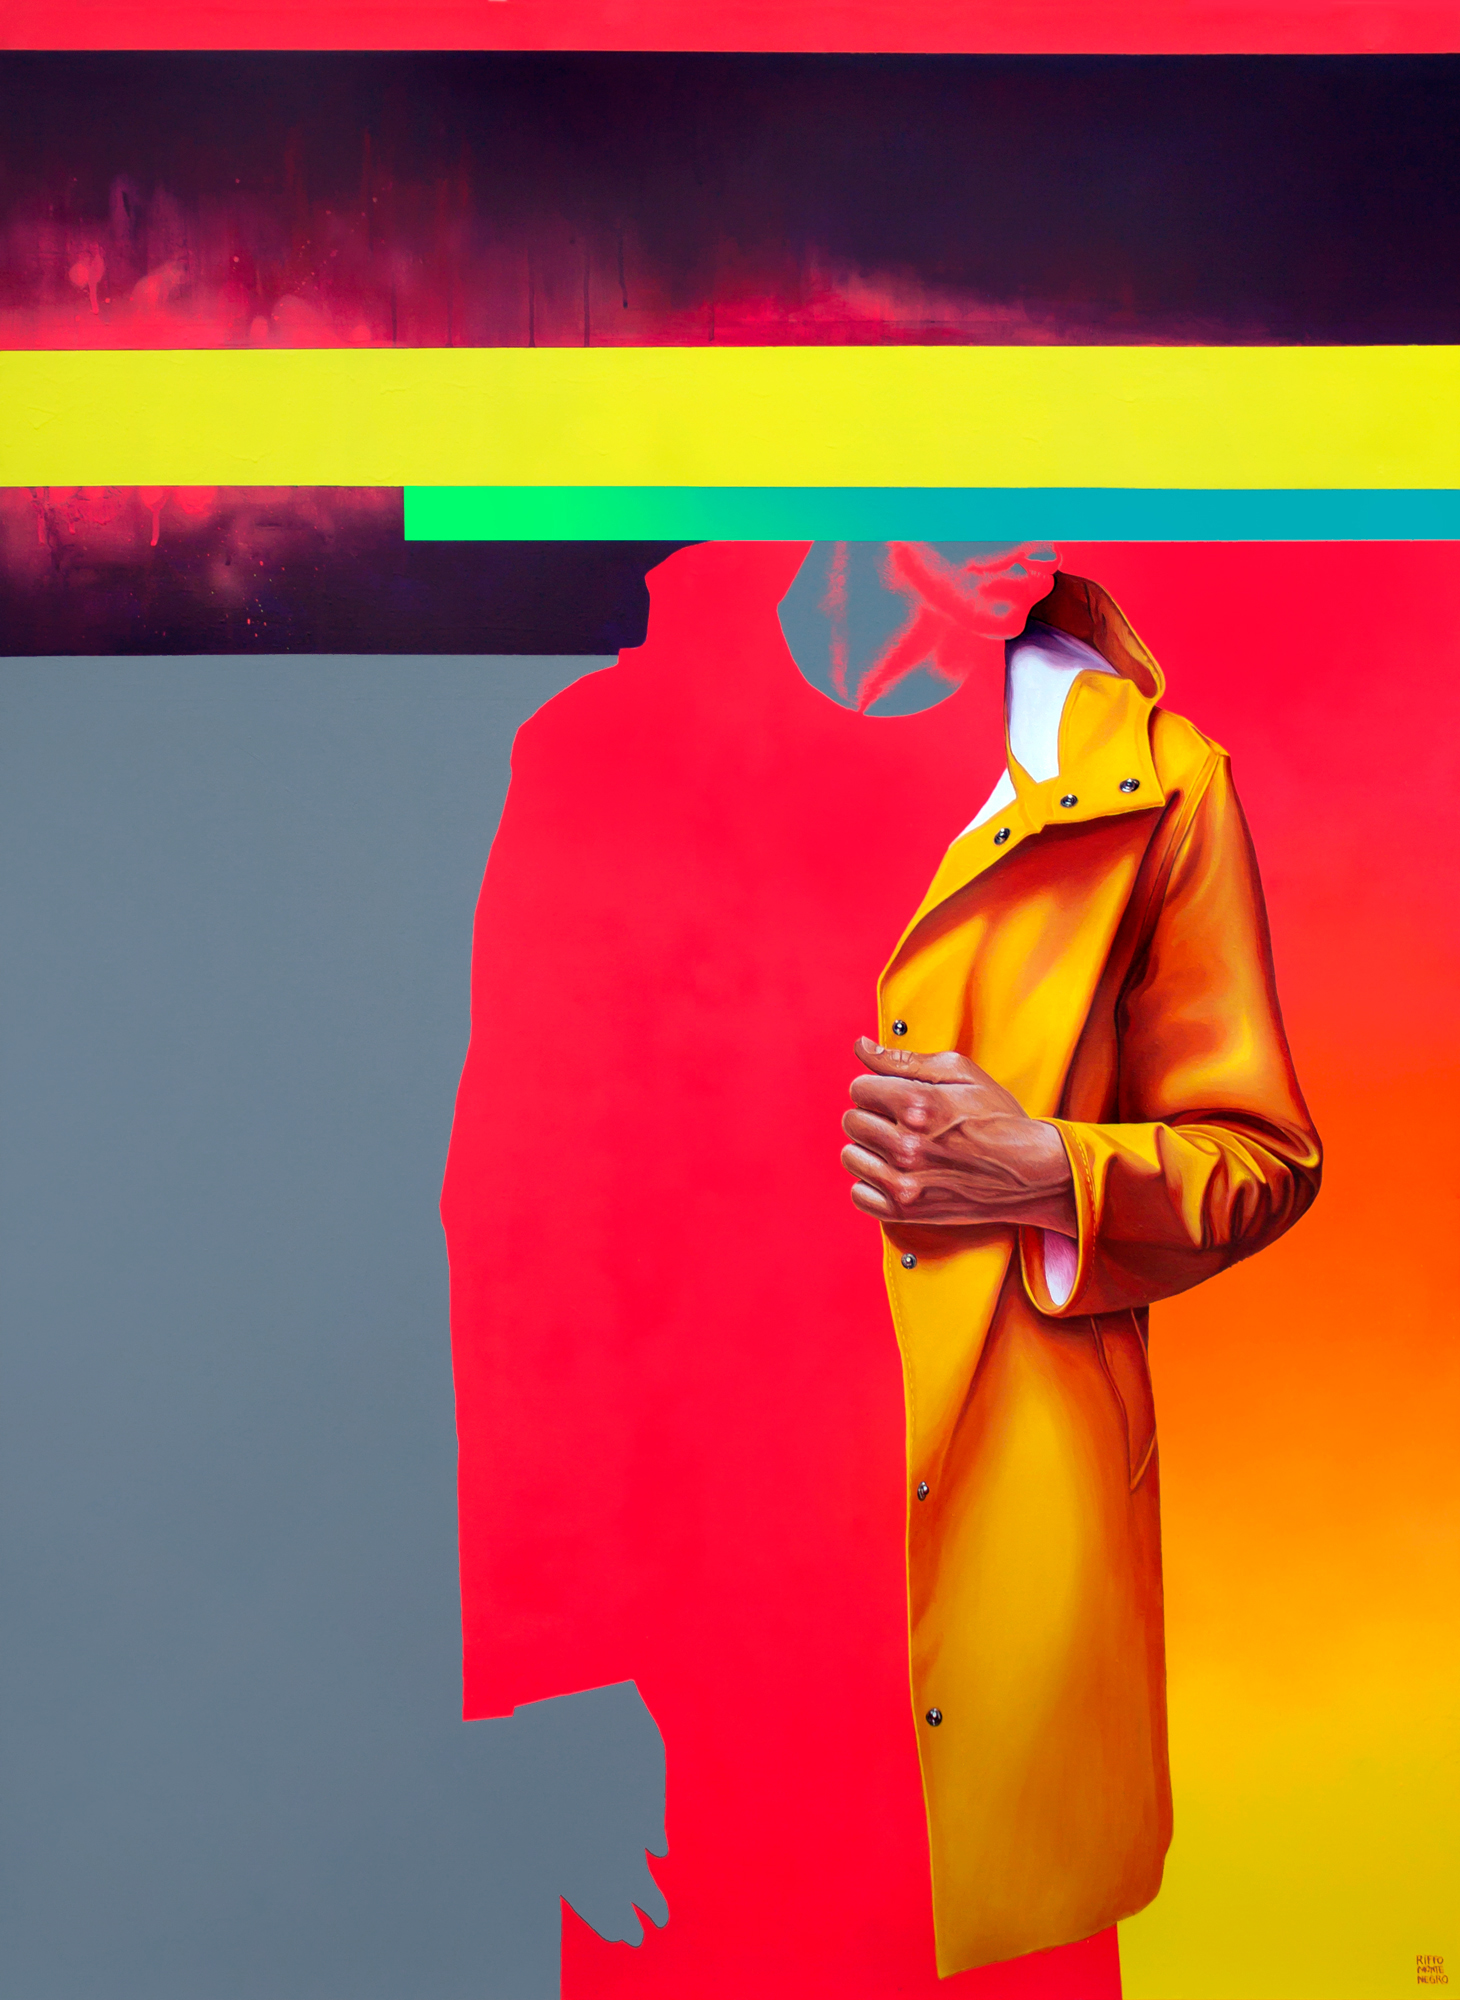 srm-untitled-yellow-150x110cm-jul2018